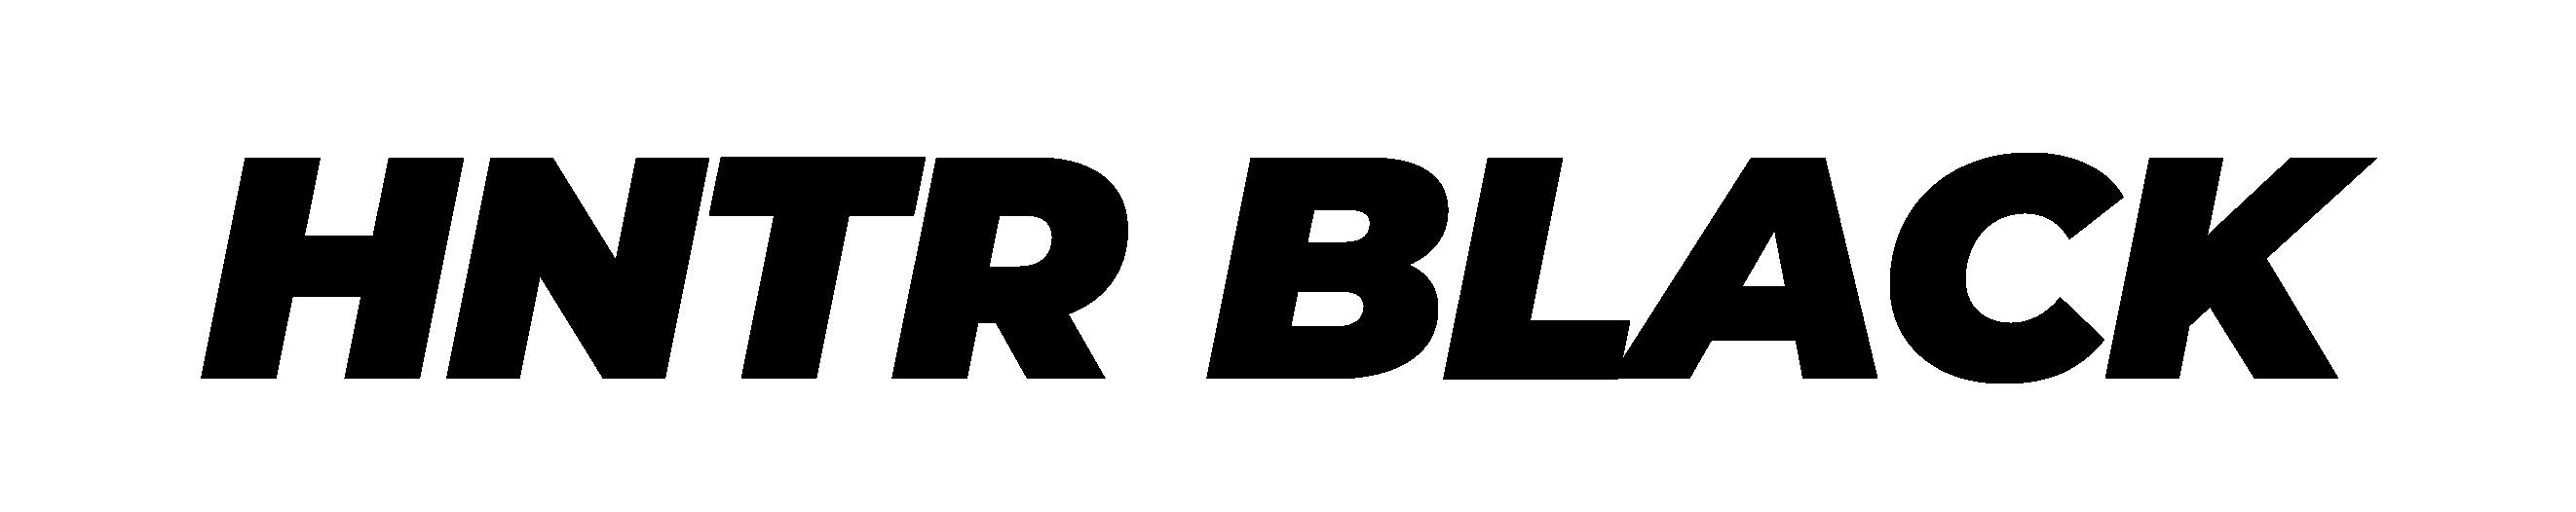 HNTR BLACK